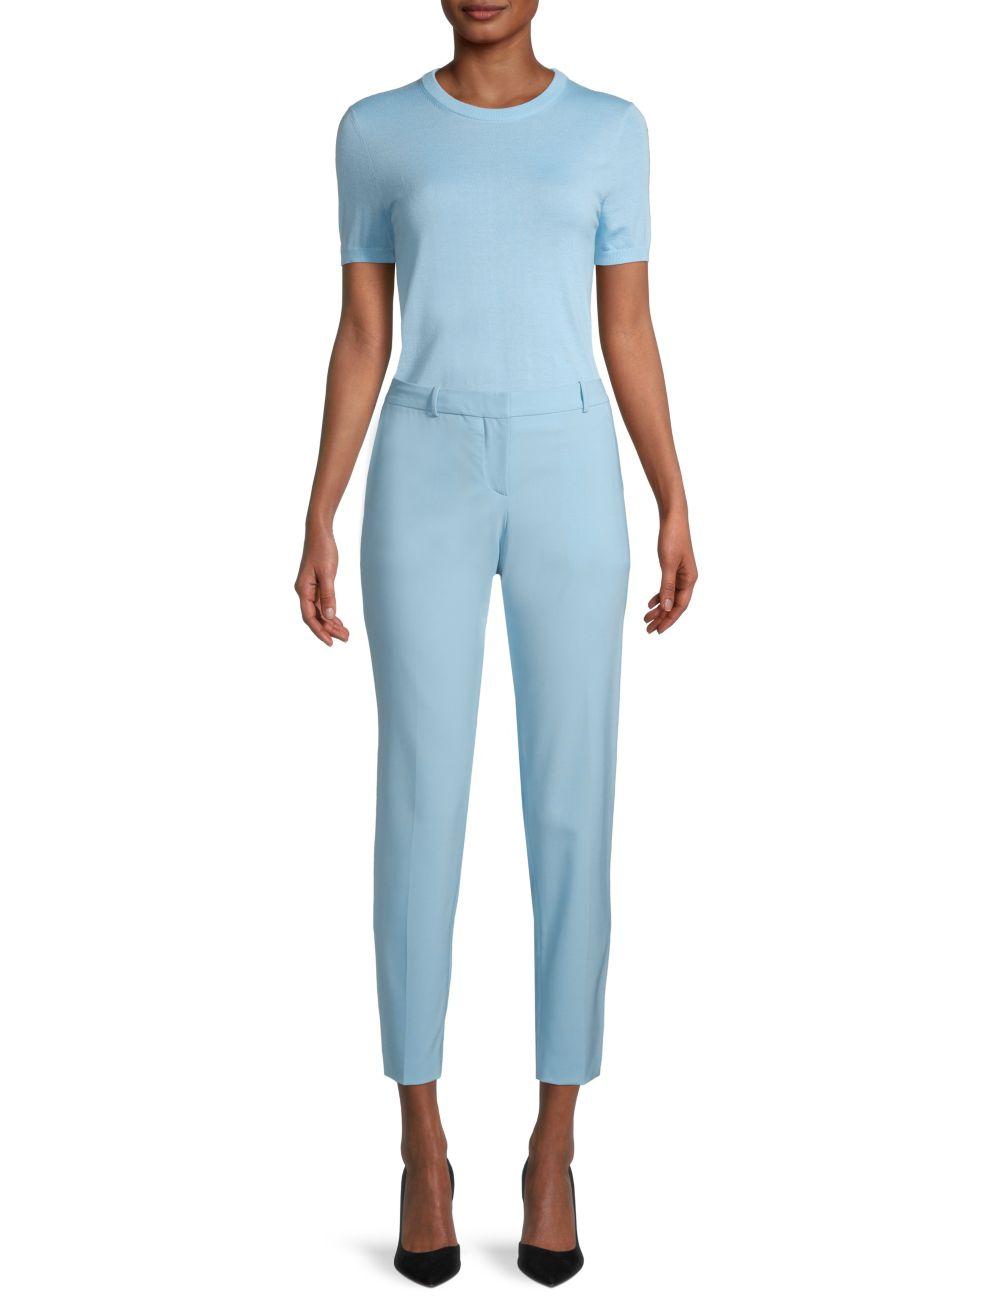 BOSS Falyssa Superfine Merino Wool Short-Sleeve Top   SaksFifthAvenue